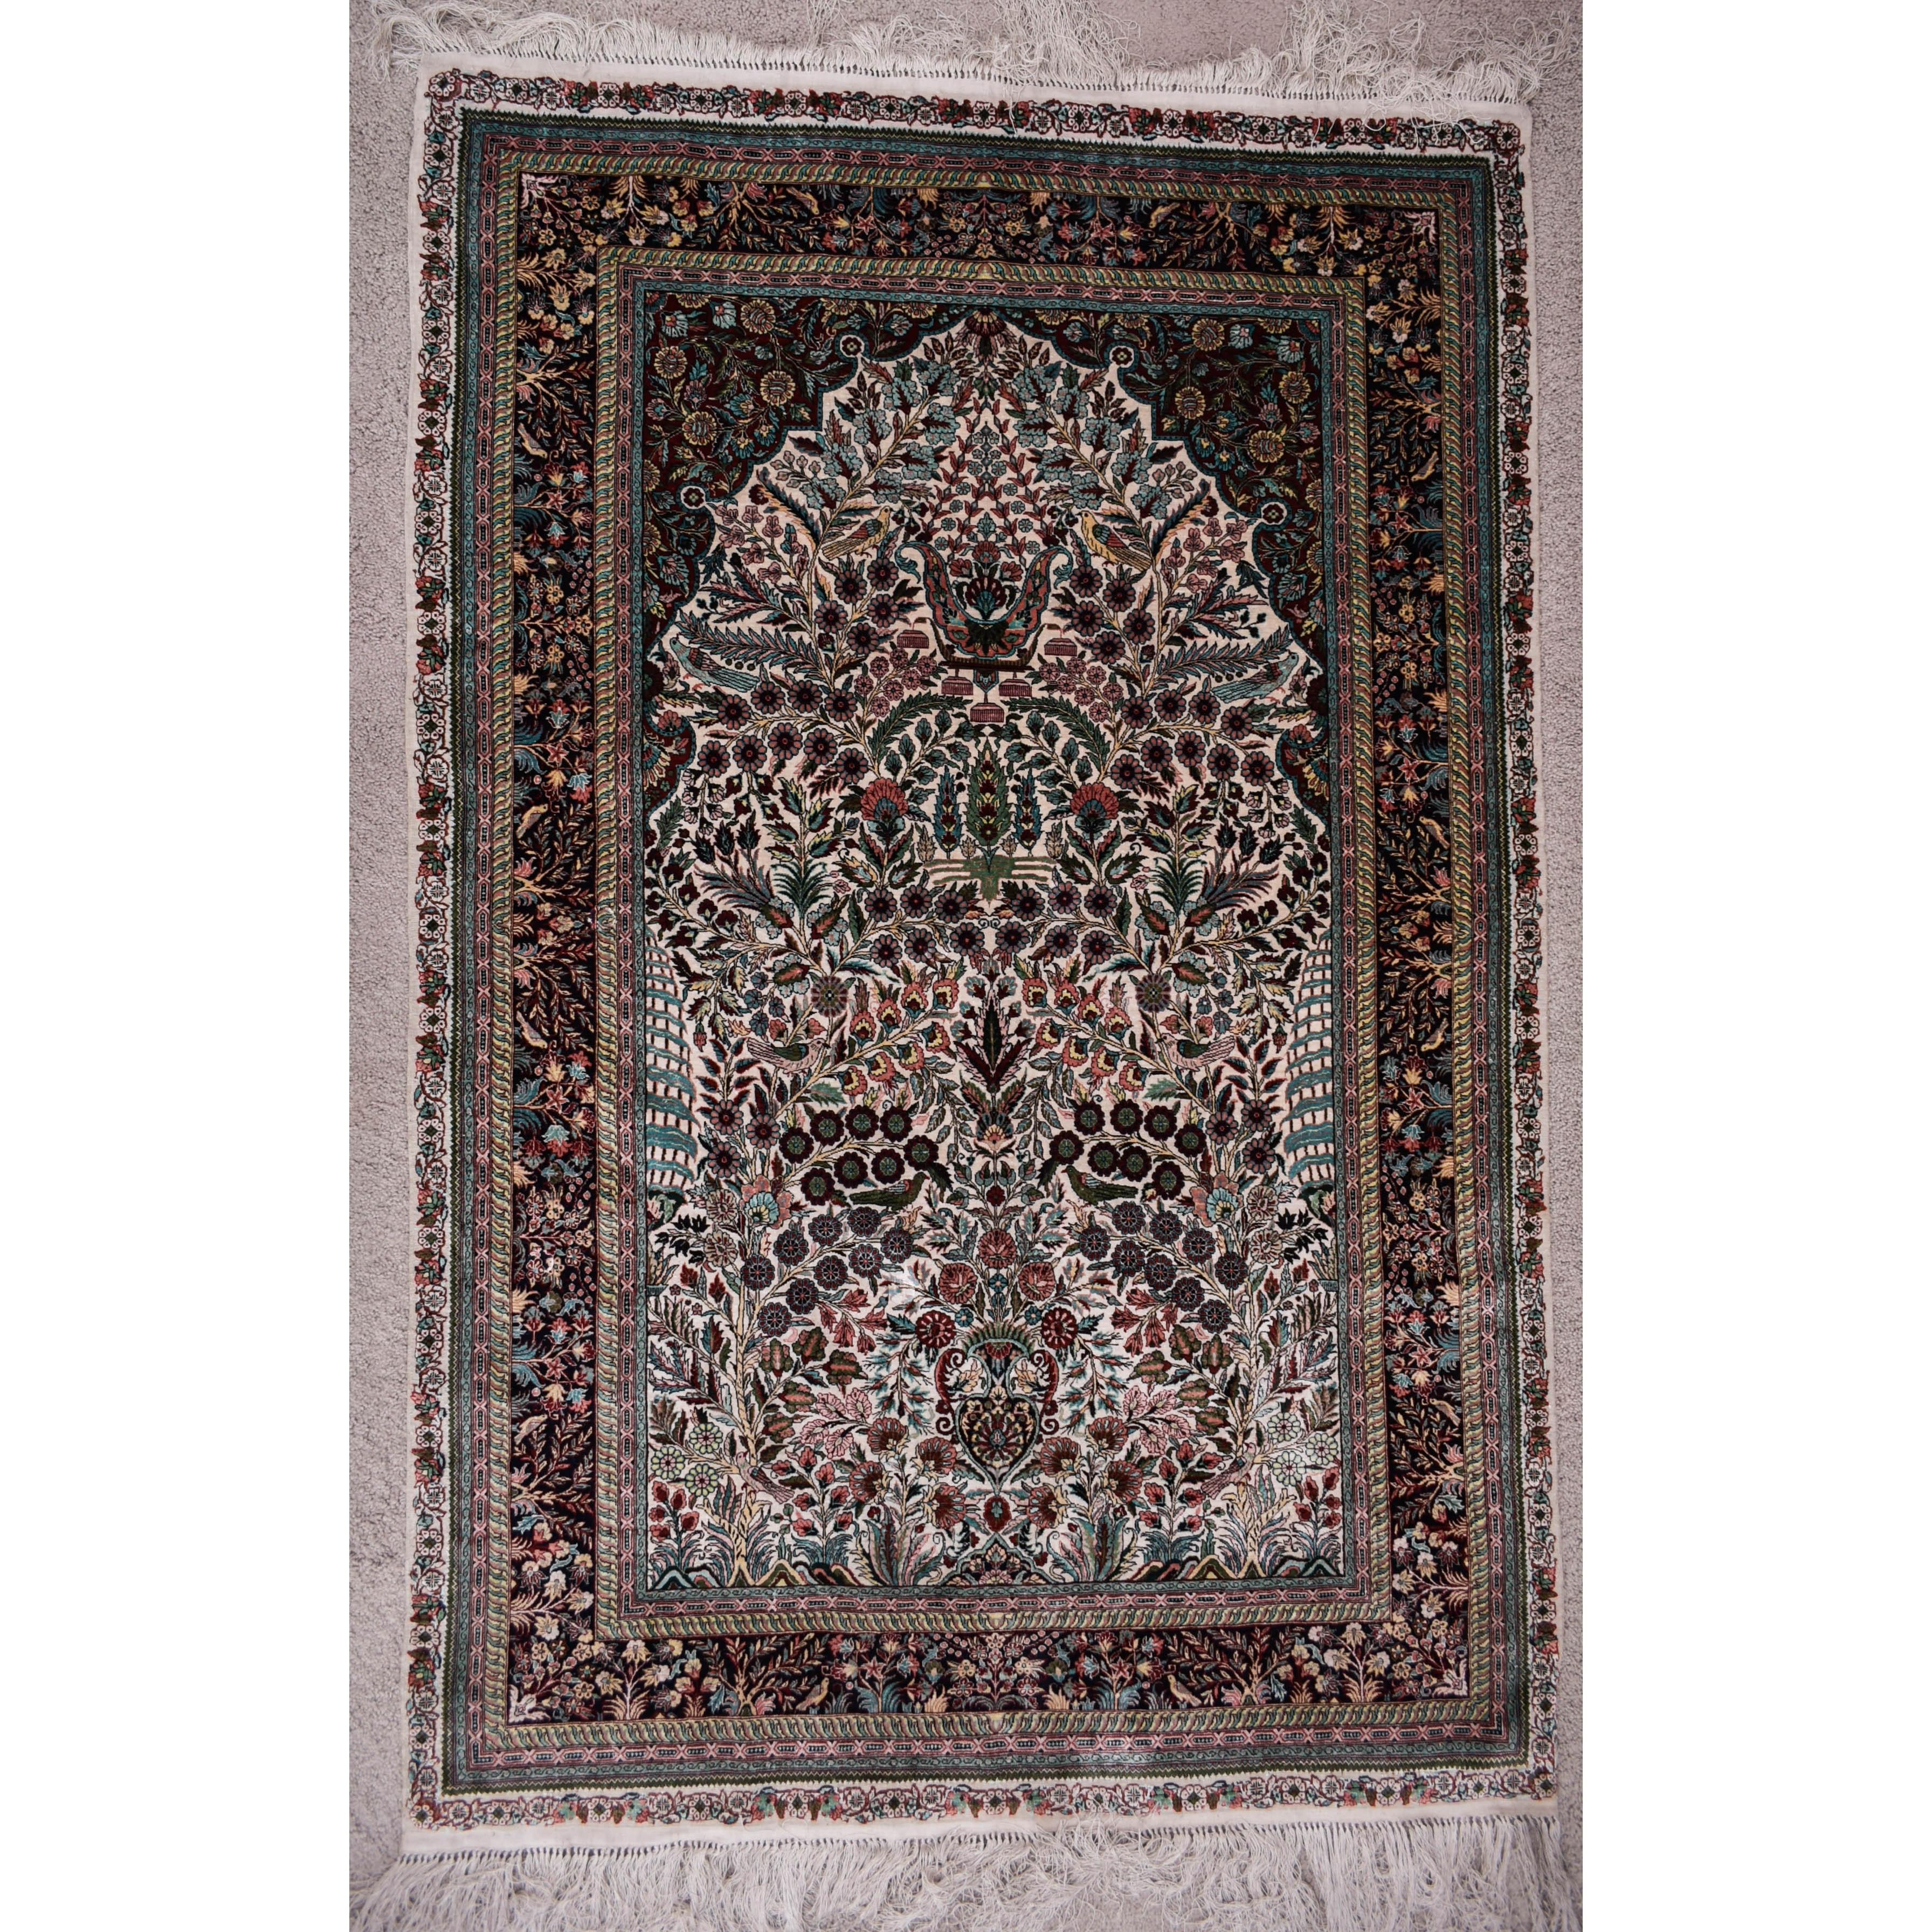 Mohtashem Kashan Tree of Life Silk Prayer Rug